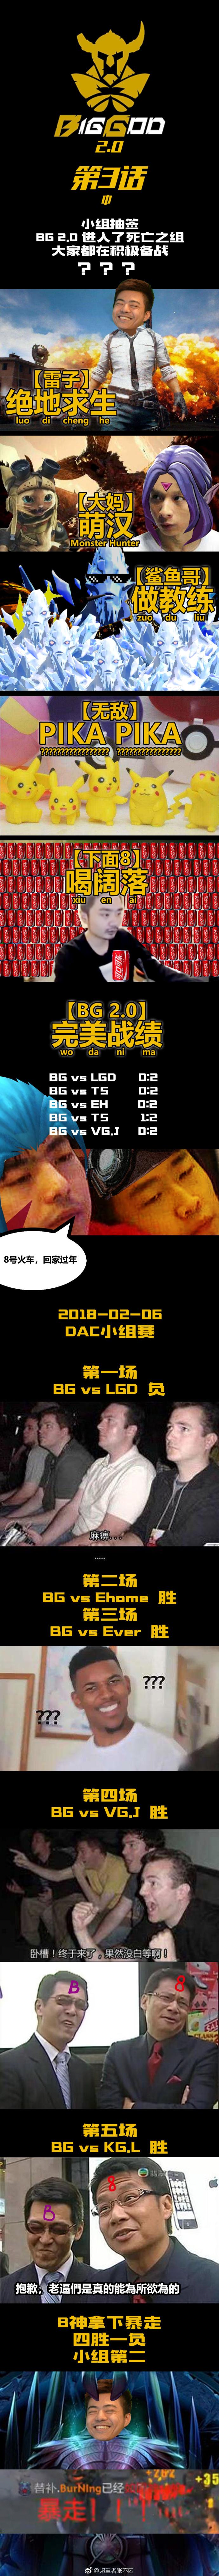 DOTA2 DAC亚洲邀请赛小剧场:BG的奇妙之旅